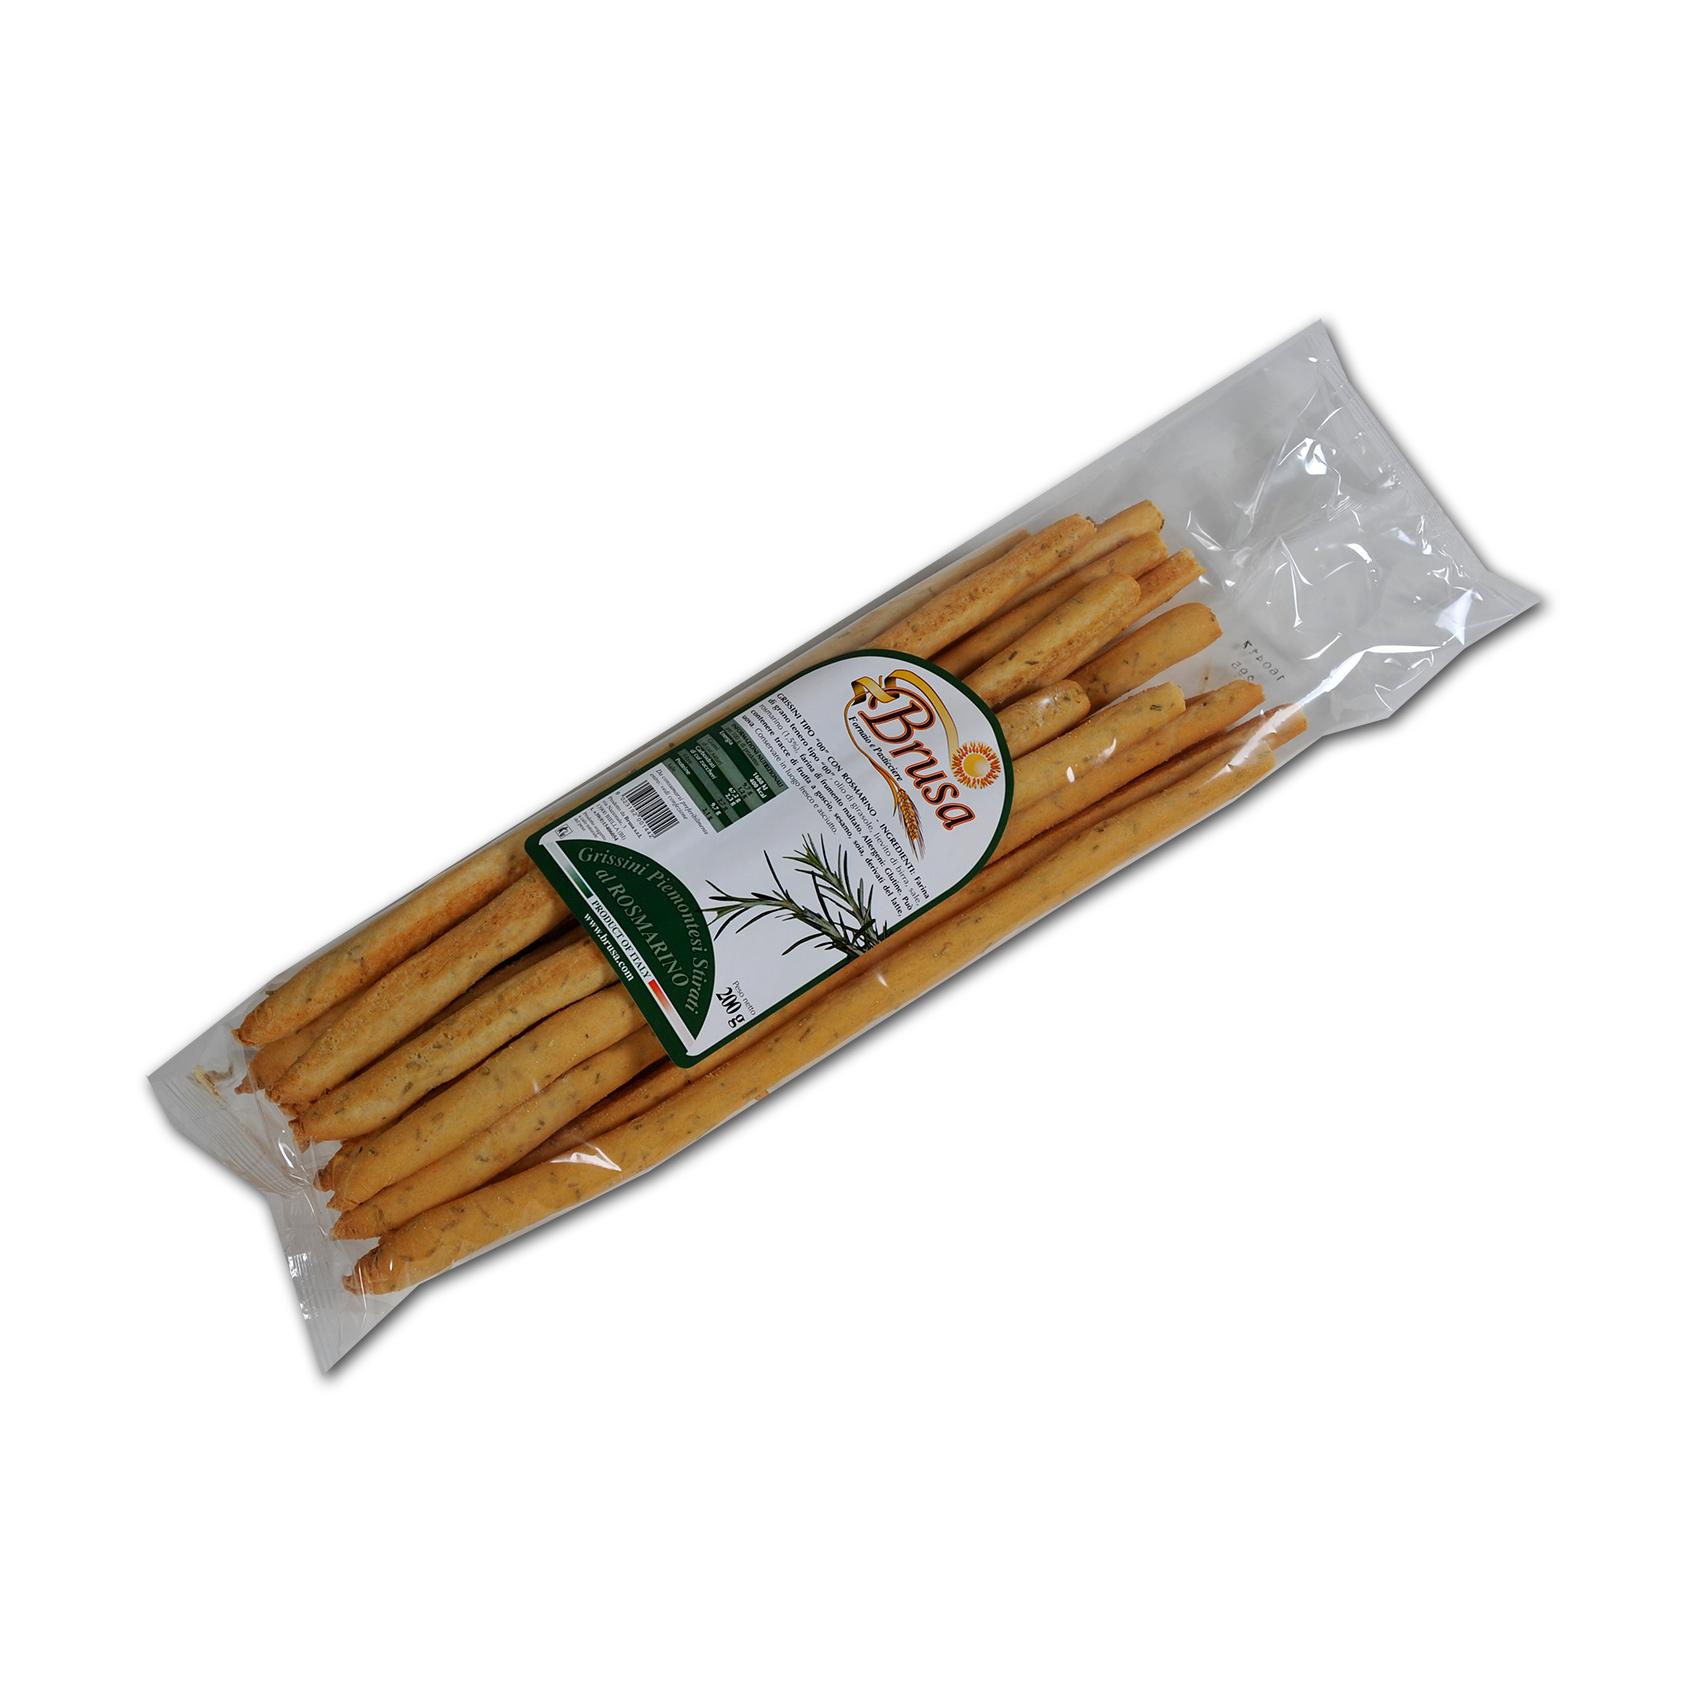 grissini-piemontesi皮埃蒙特迷迭香面包条-200g